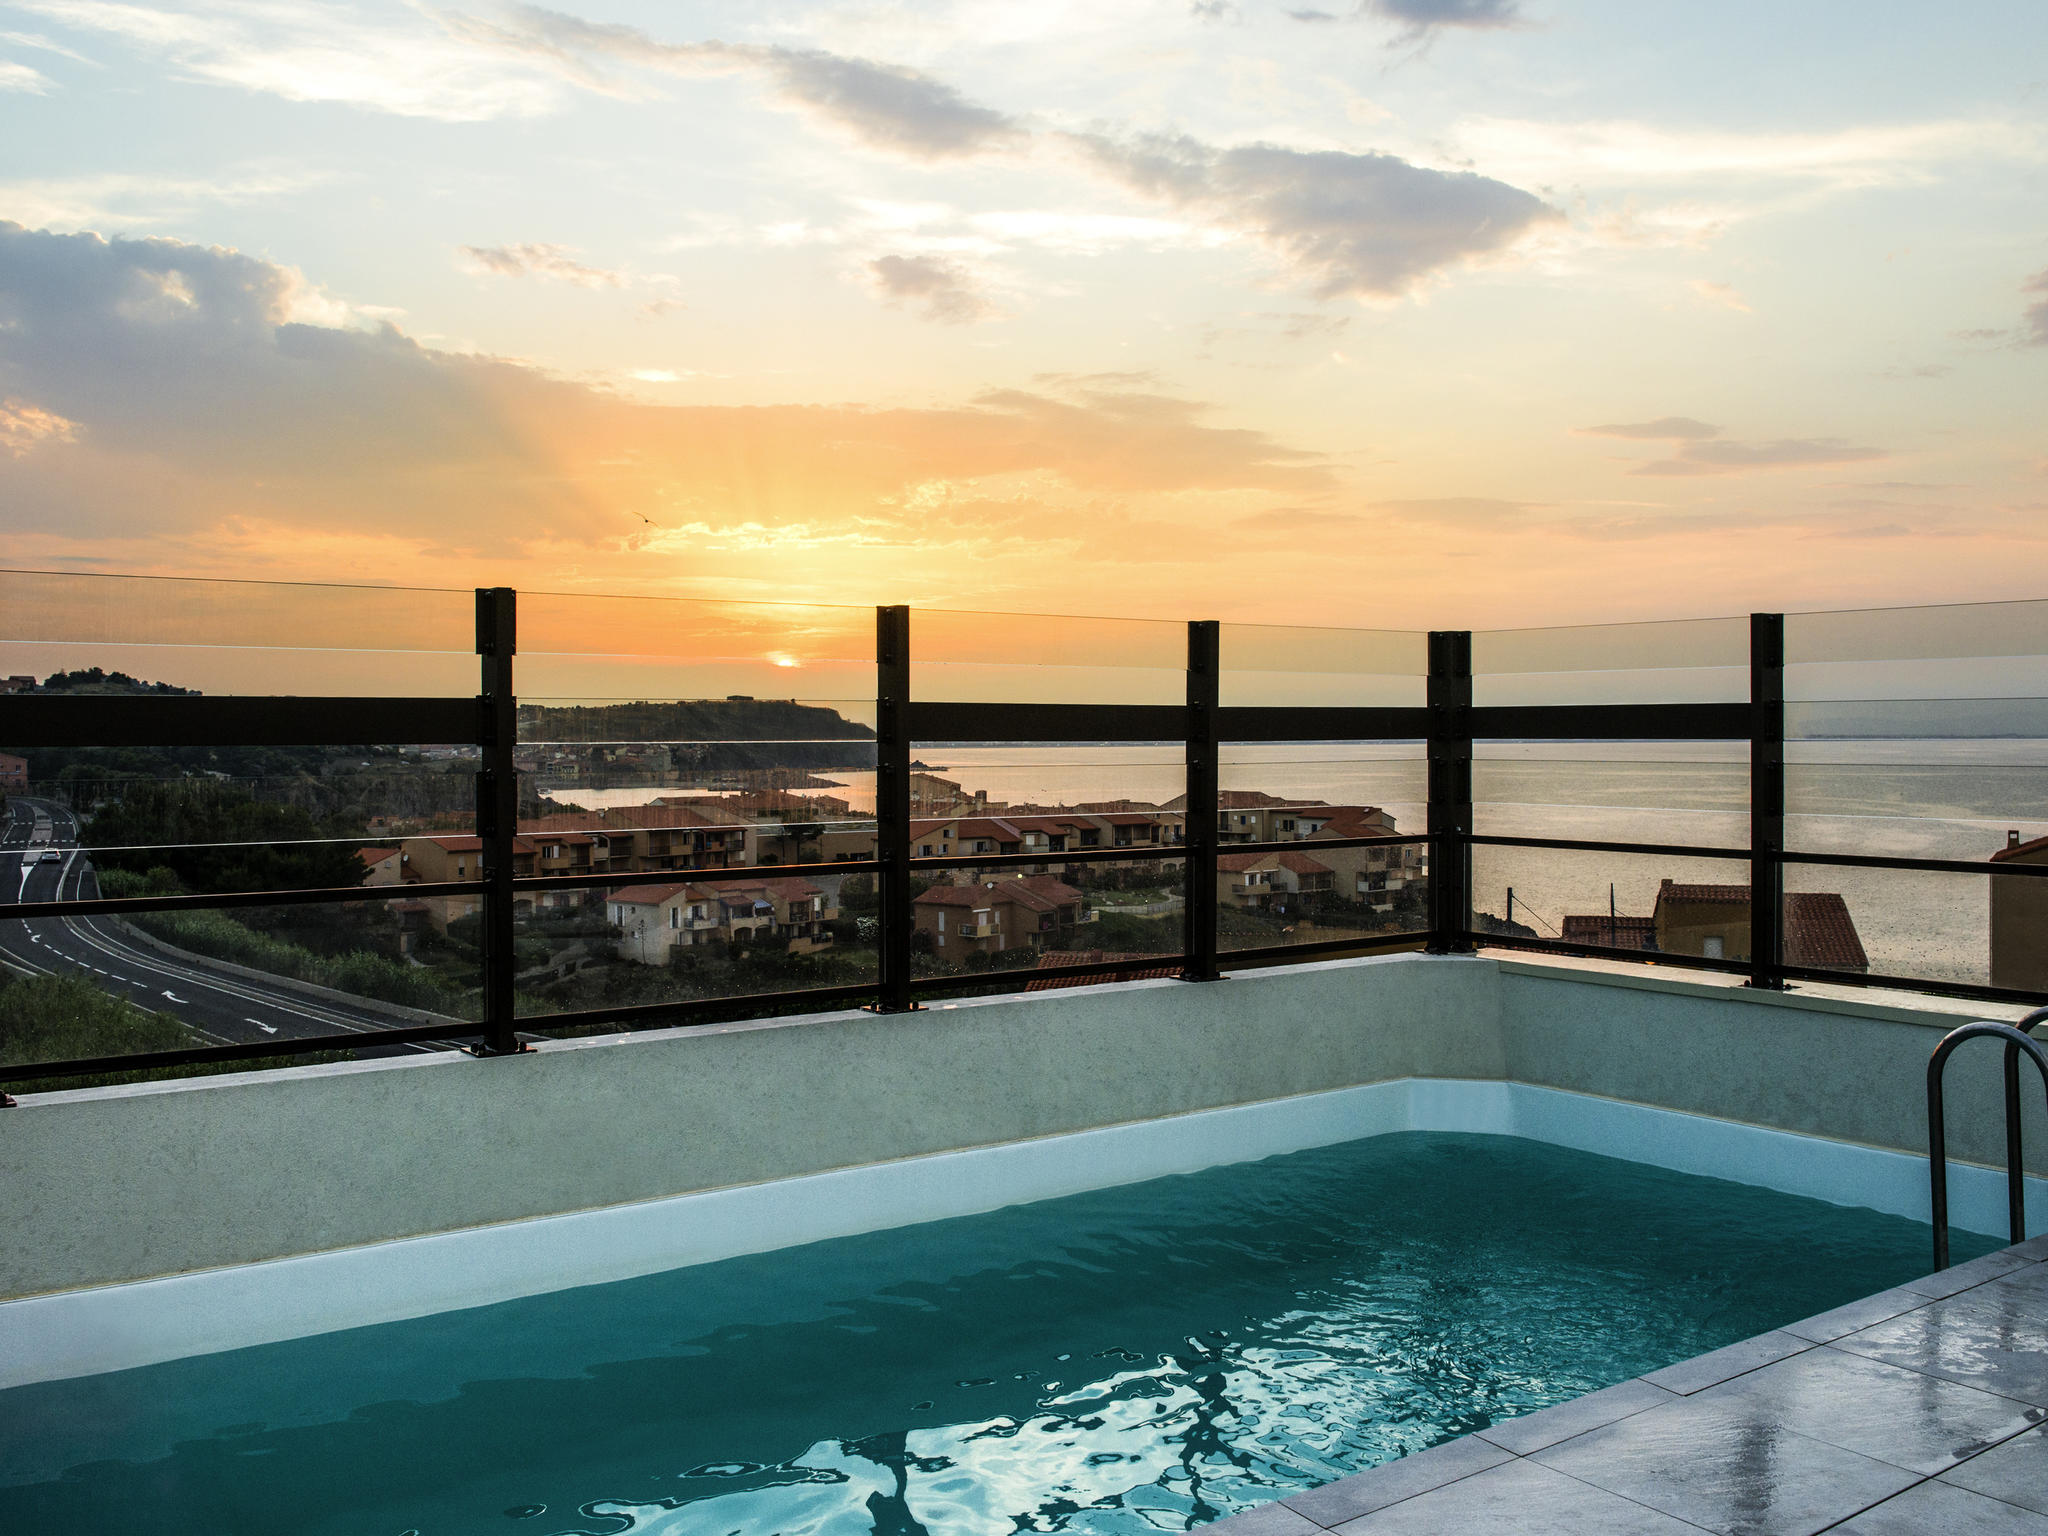 Hotell – ibis Styles Collioure Port-Vendres